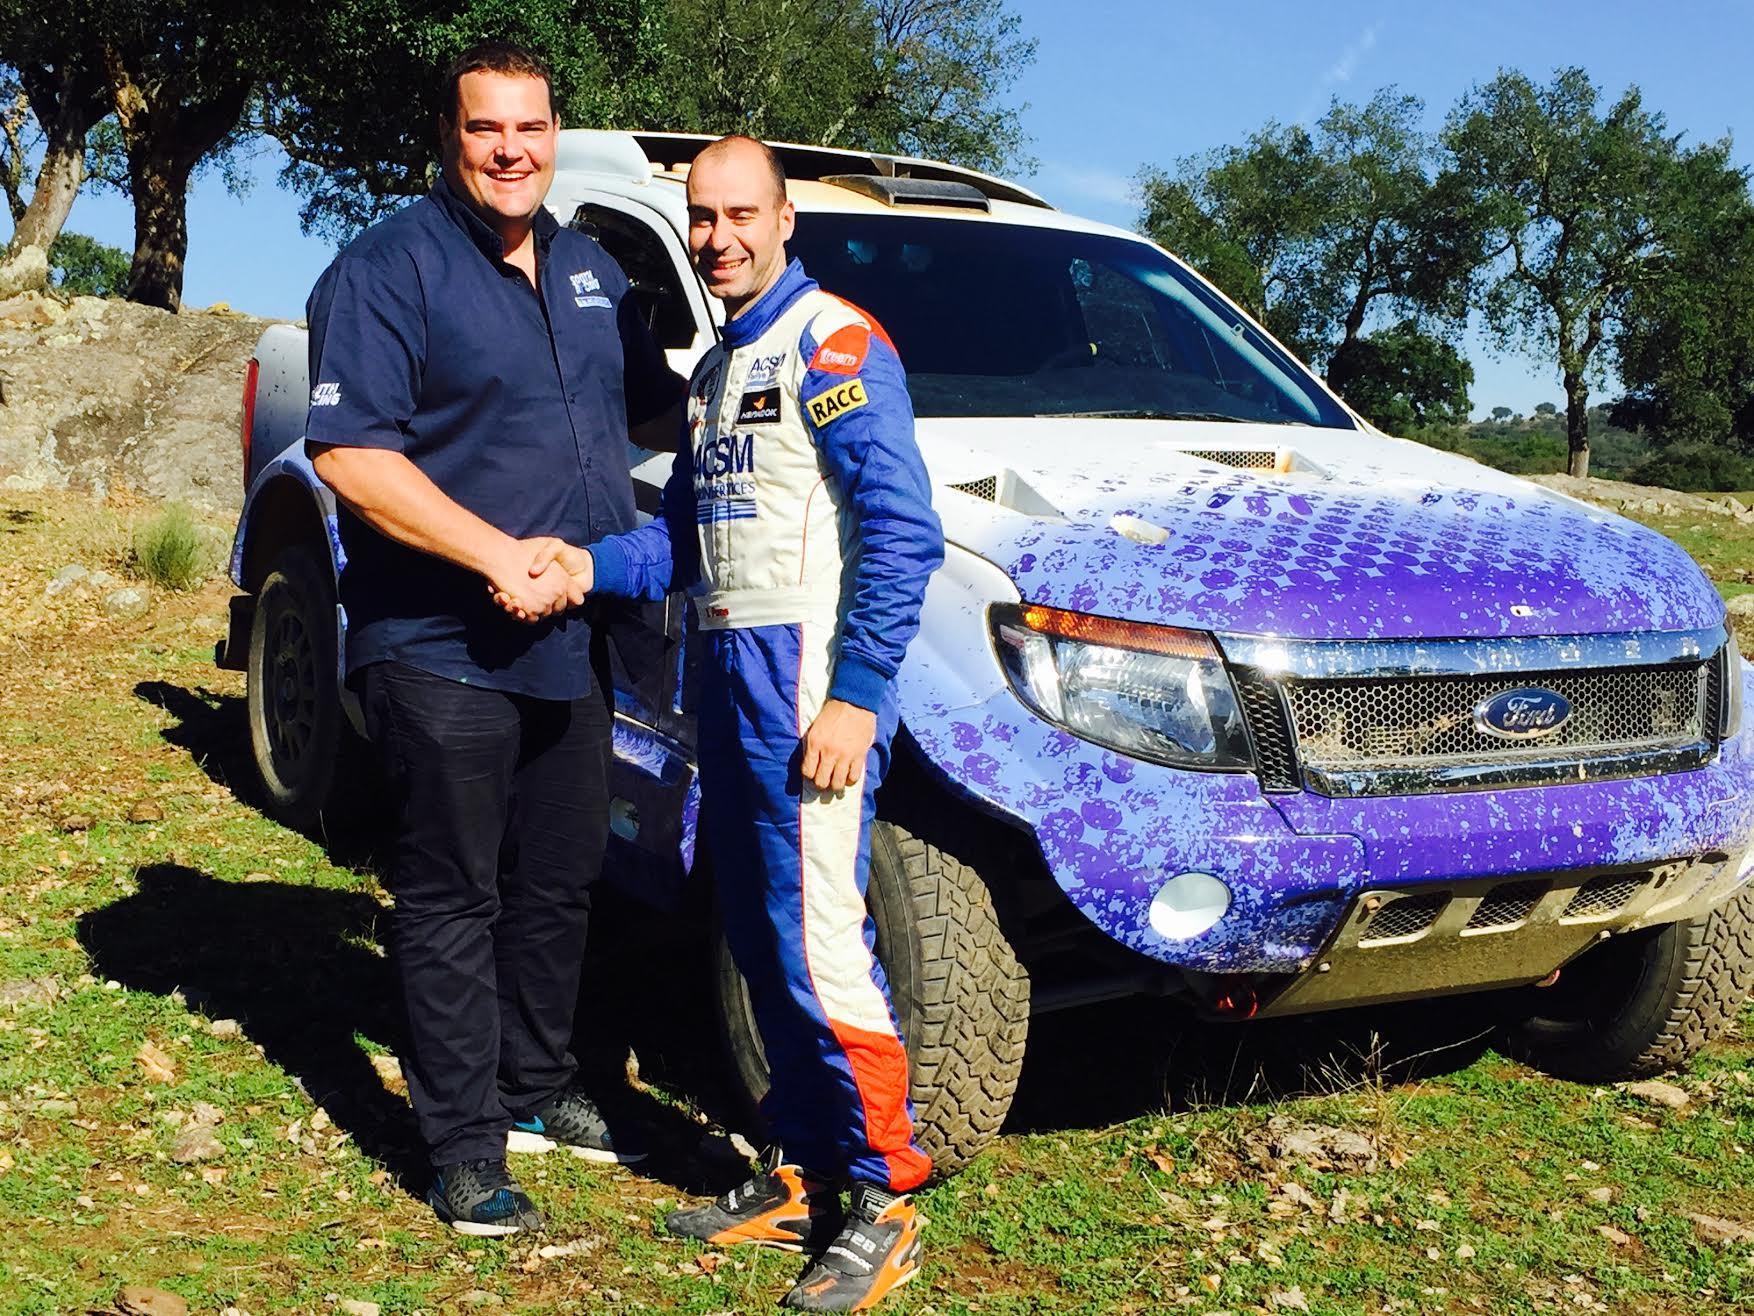 2016 Rallye Raid Dakar Argentina - Bolivia [3-16 Enero] - Página 2 CTDS4pKWwAAPh_H